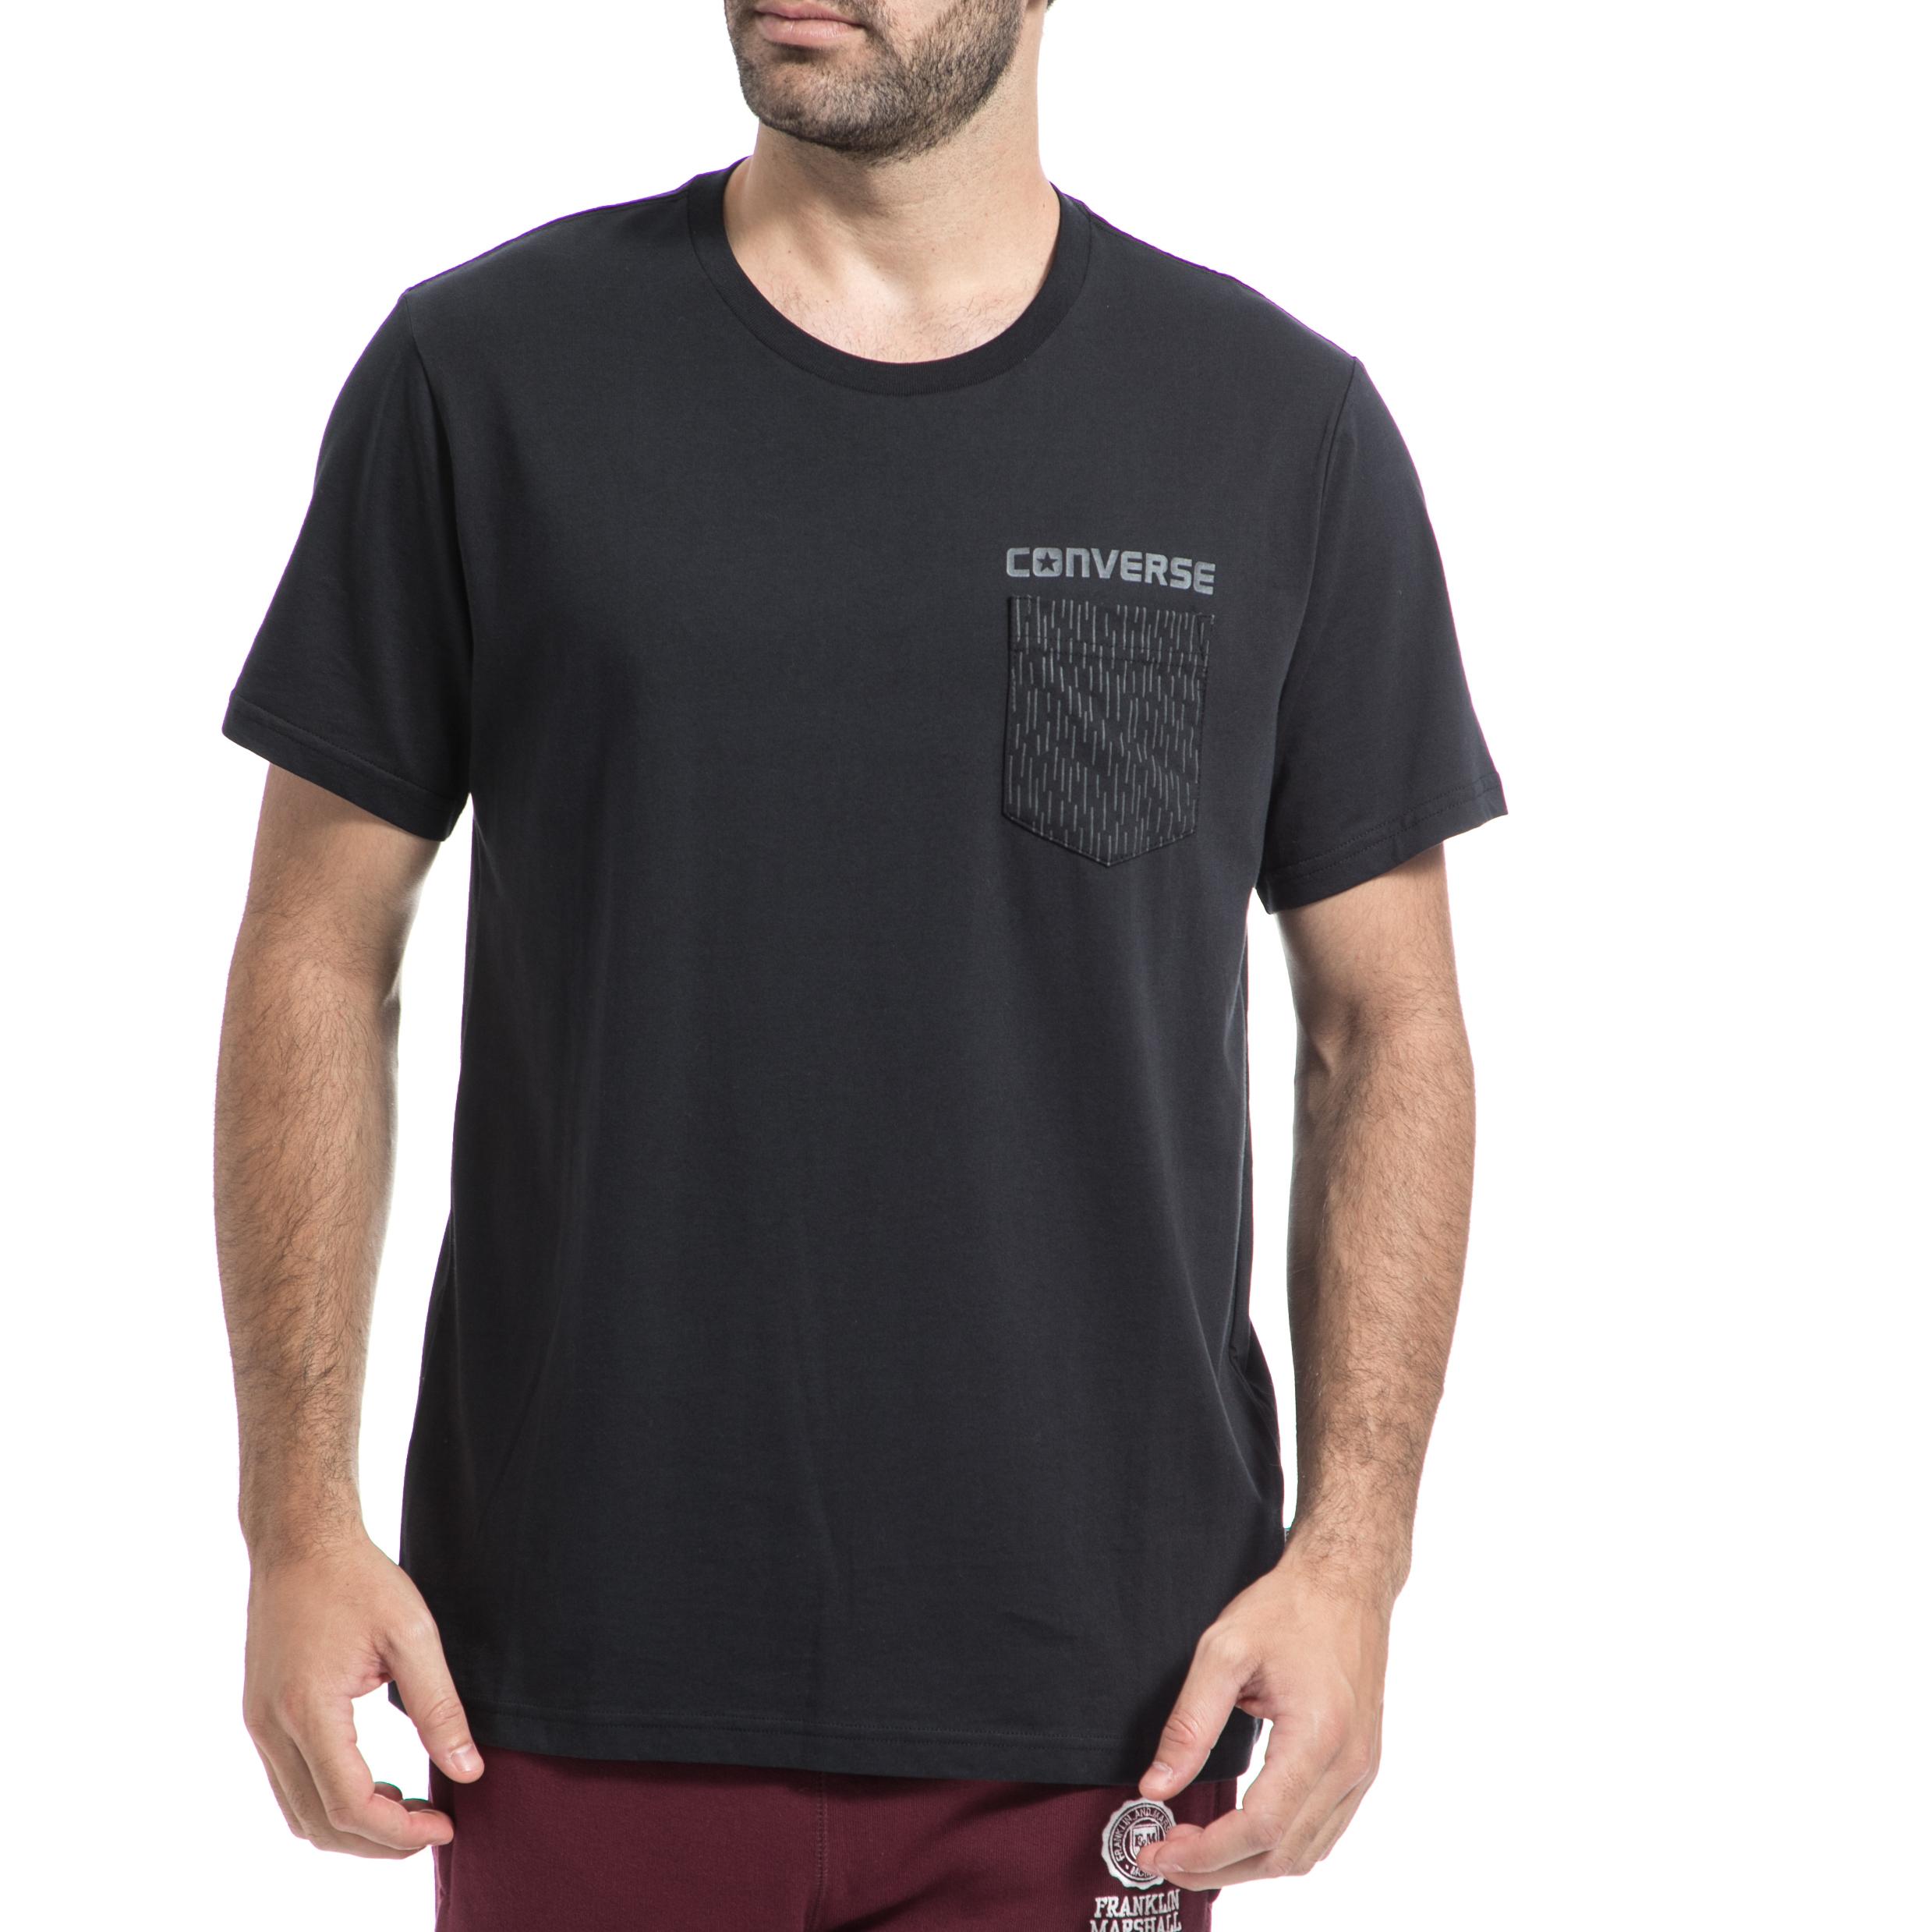 CONVERSE – Ανρική μπλούζα CONVERSE μαύρη